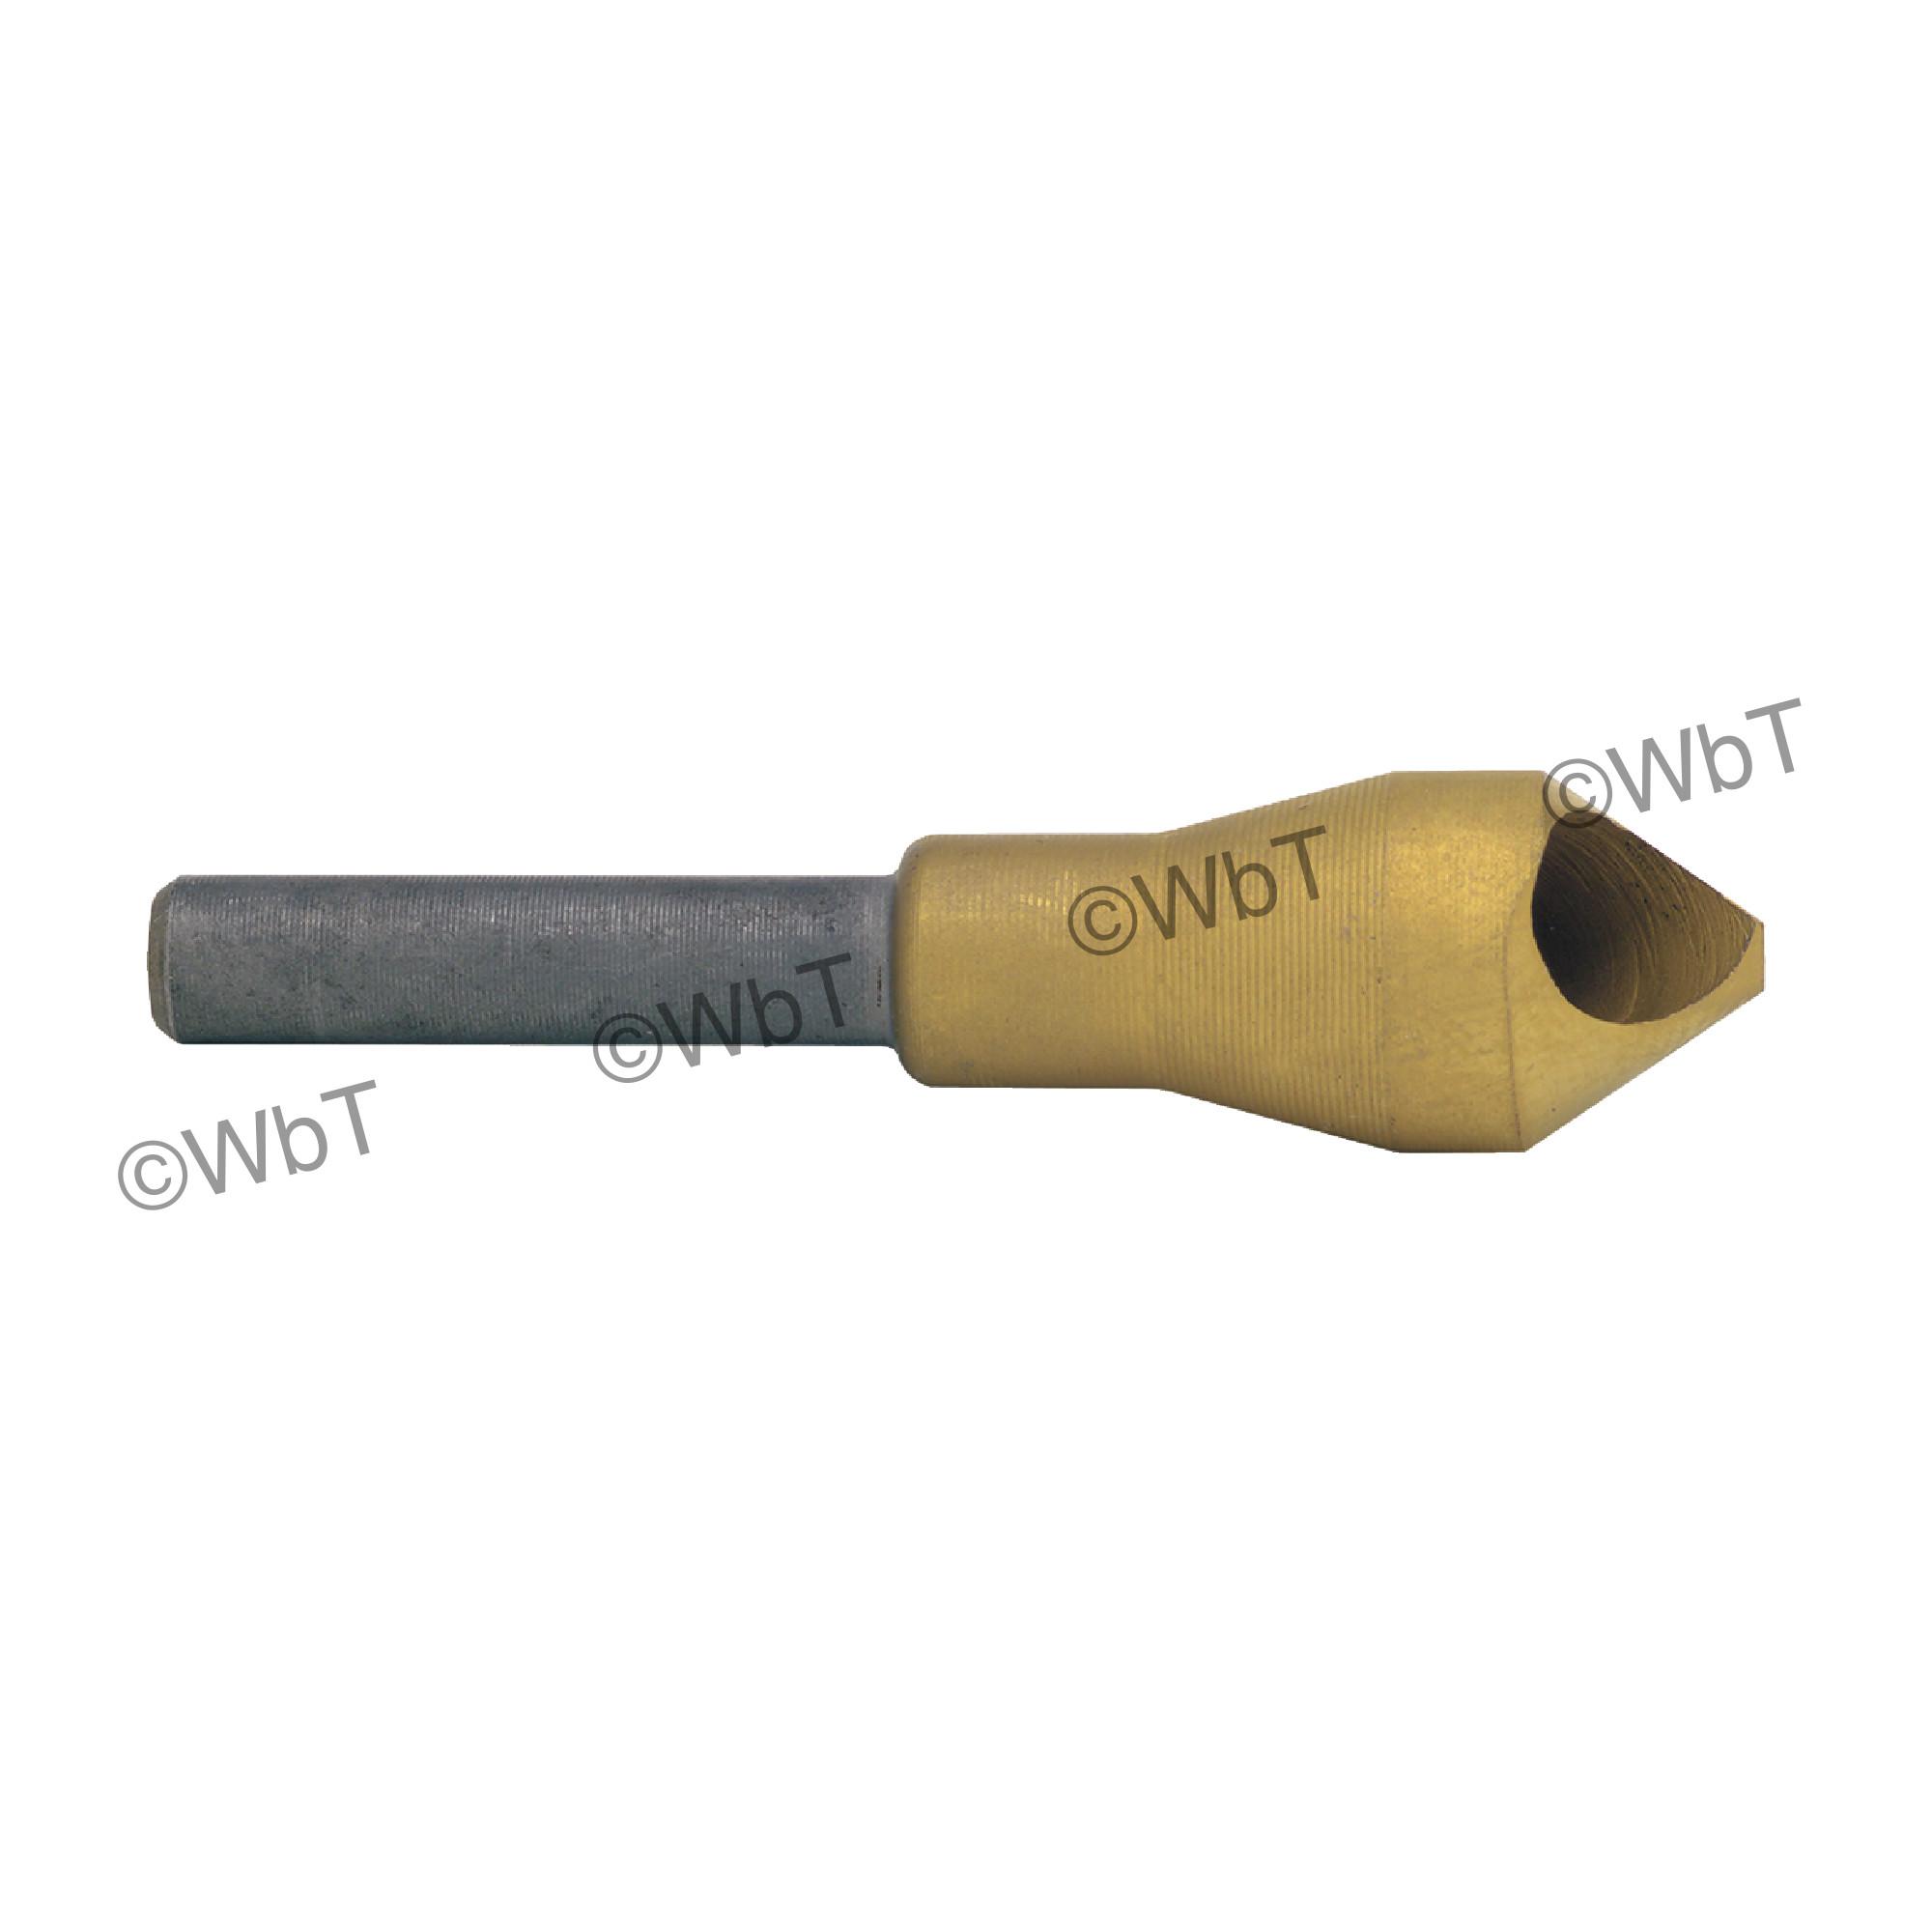 Zero Flute H.S.S. Countersink & Deburring Tool